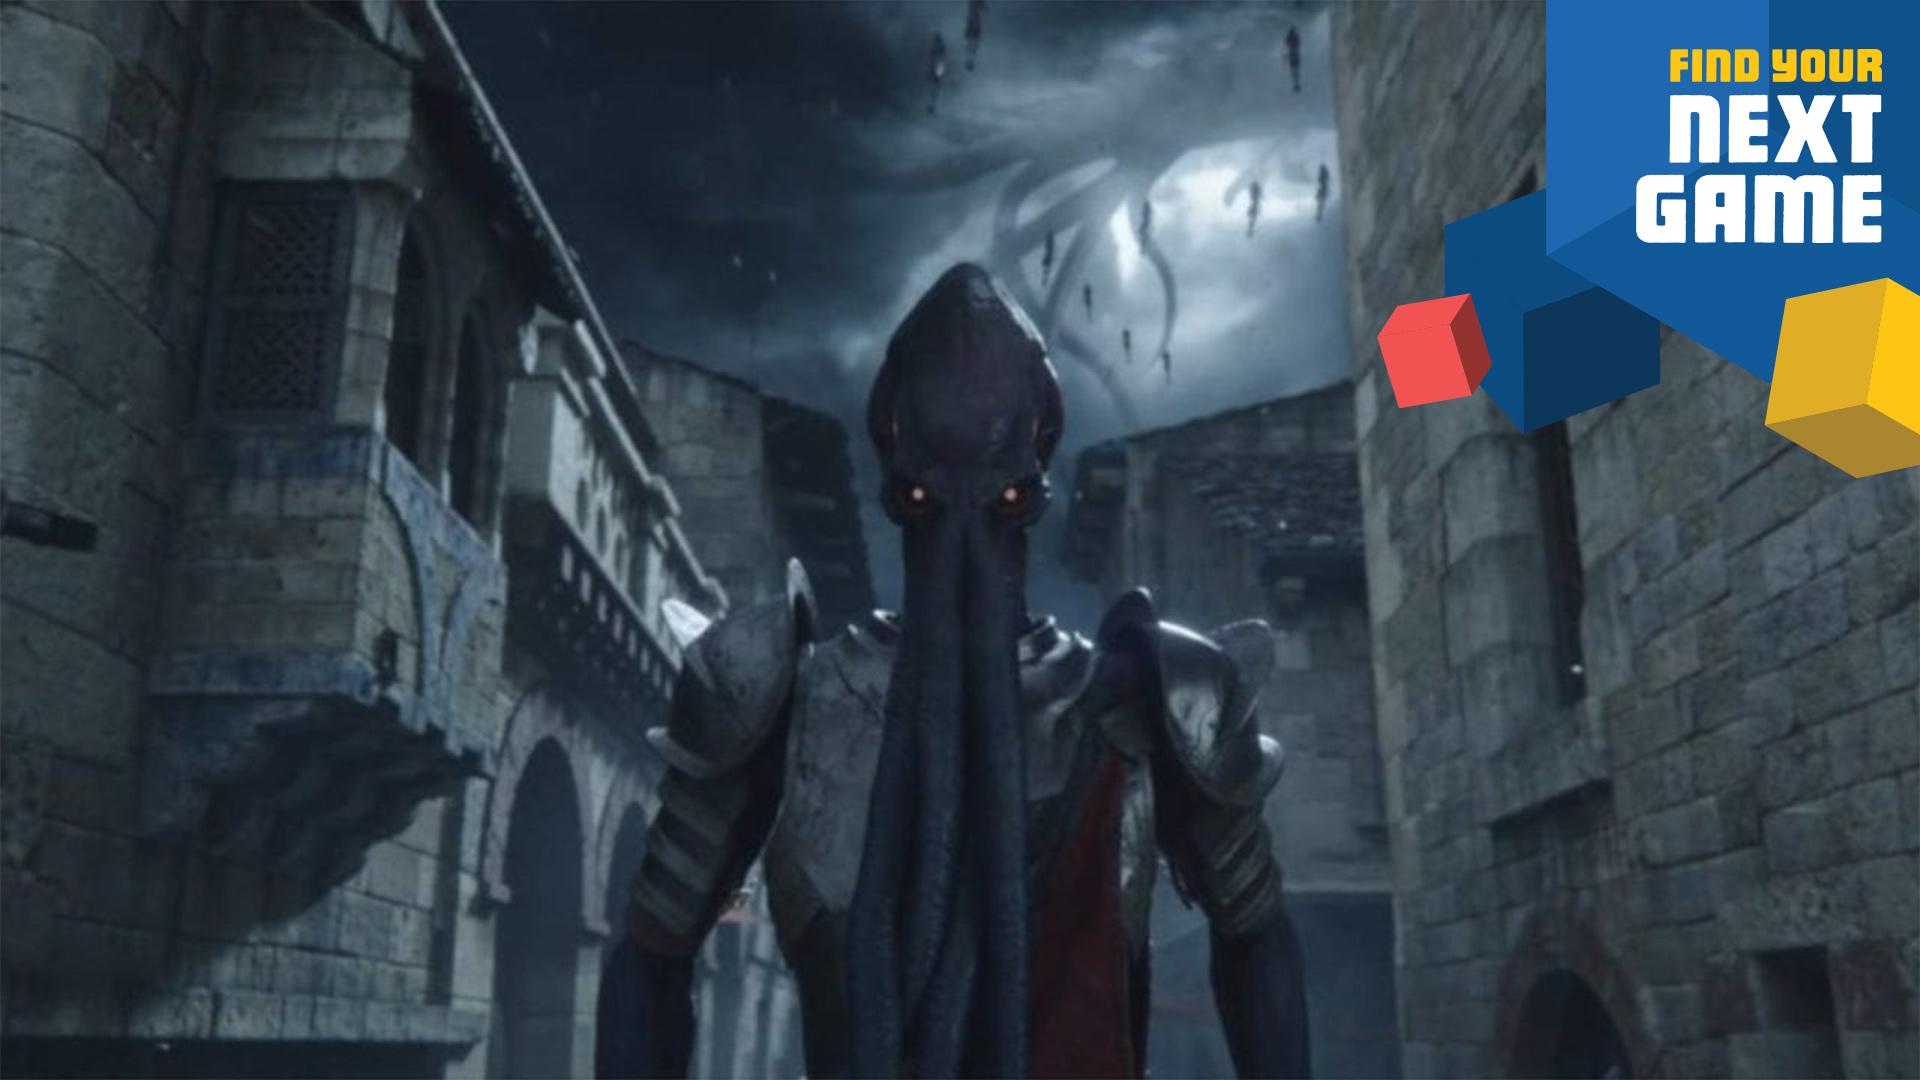 Baldur's Gate III: Early Access Reveals New Release Date